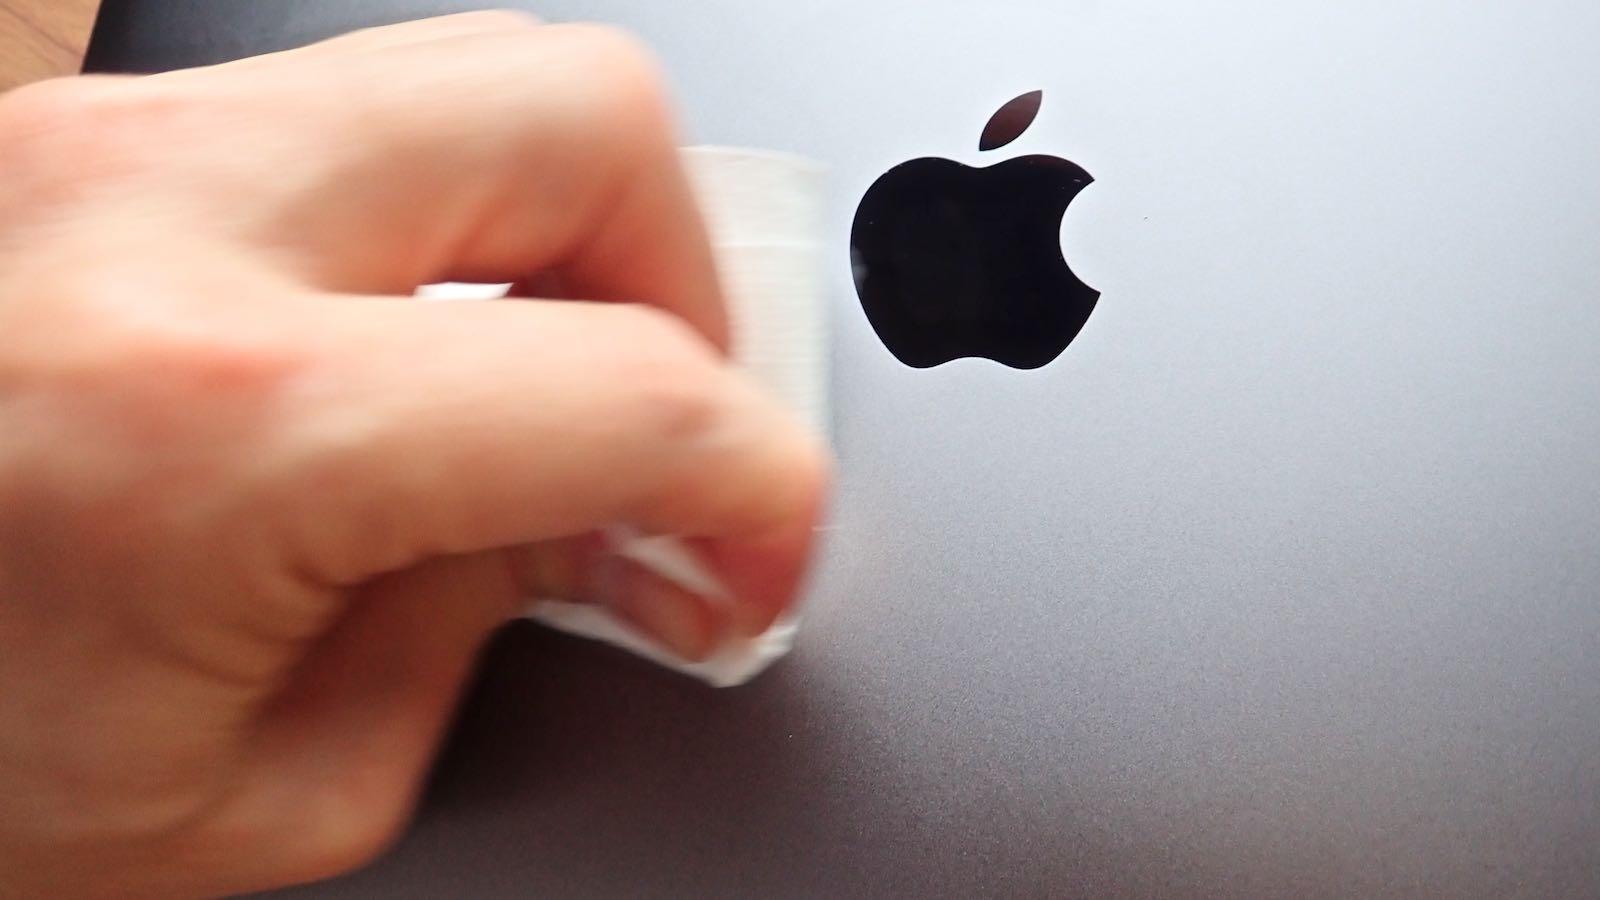 0202 Apple maintenance item Quality MacBook 2017 12inch 016